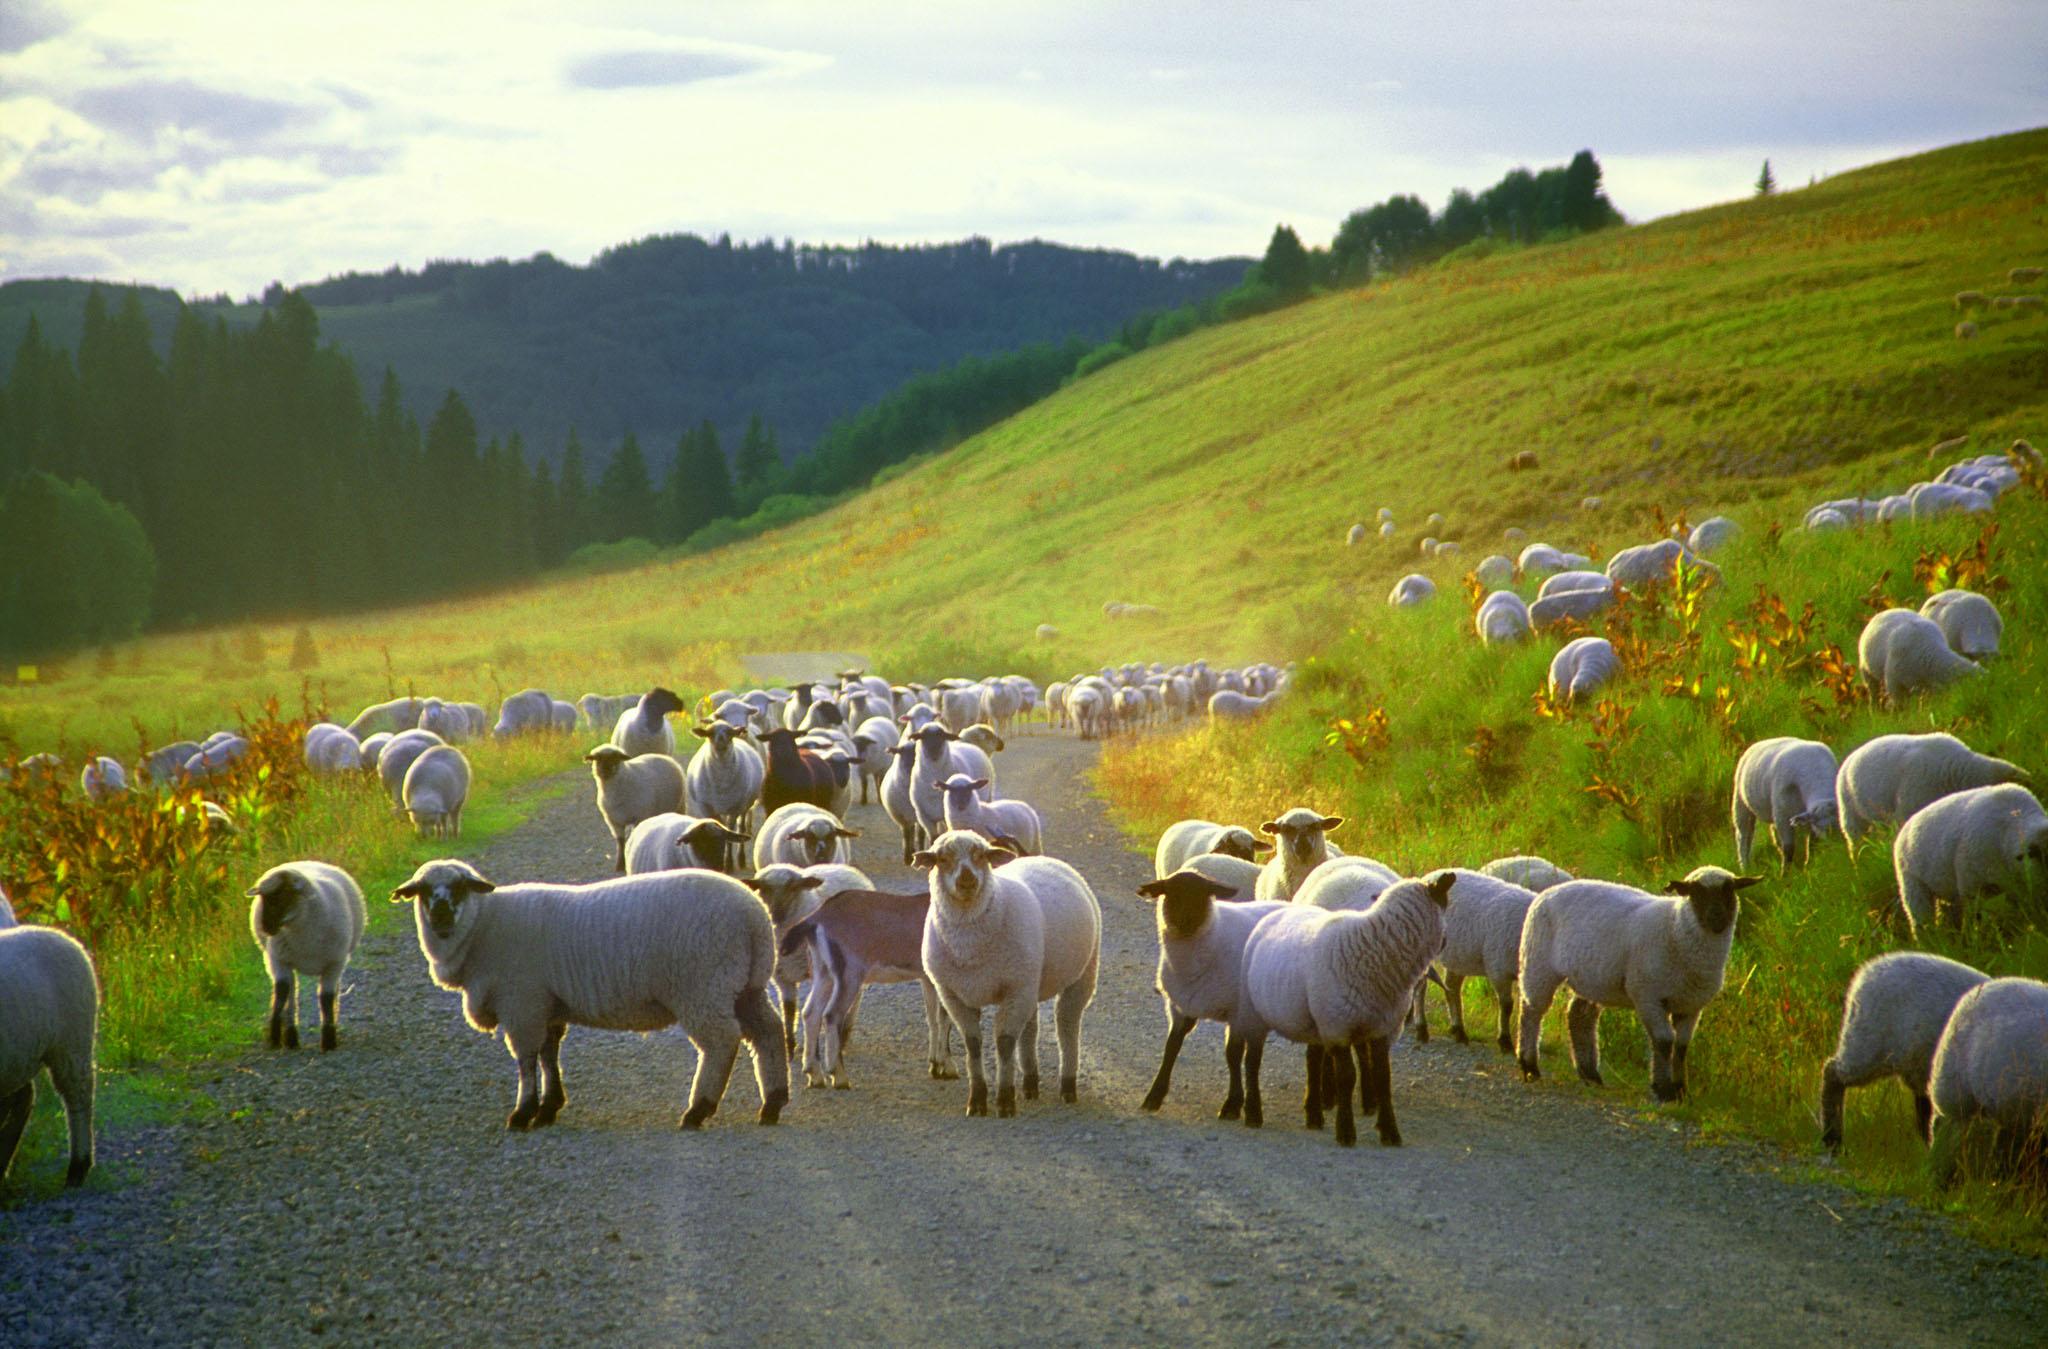 Landscape,sheep on mountainside,